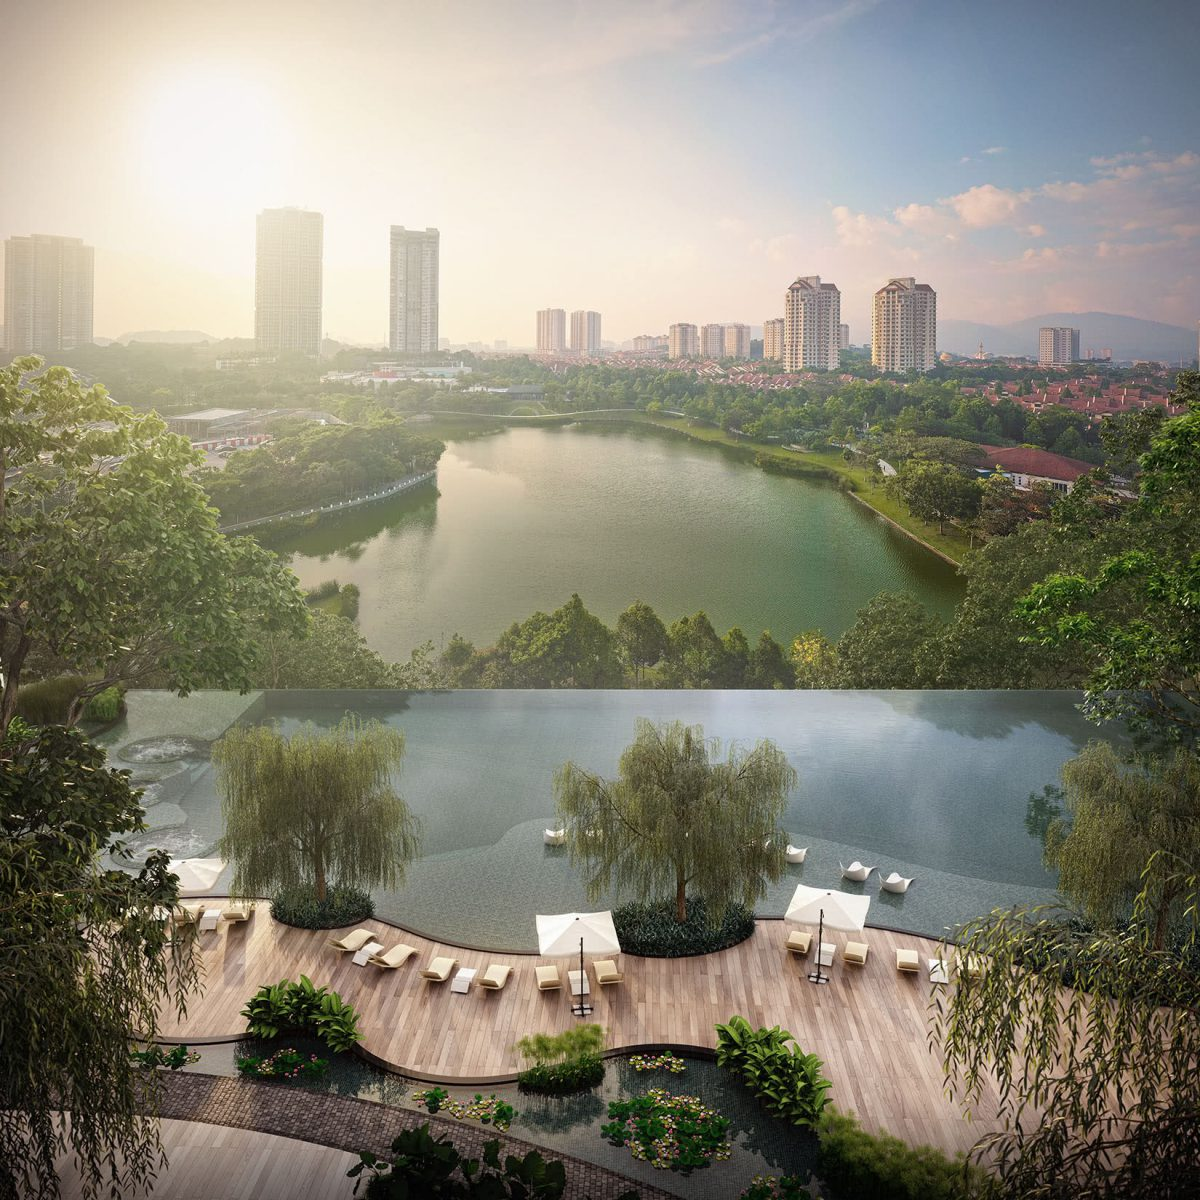 park regent malaysia property infinity pool - Luxe Digital